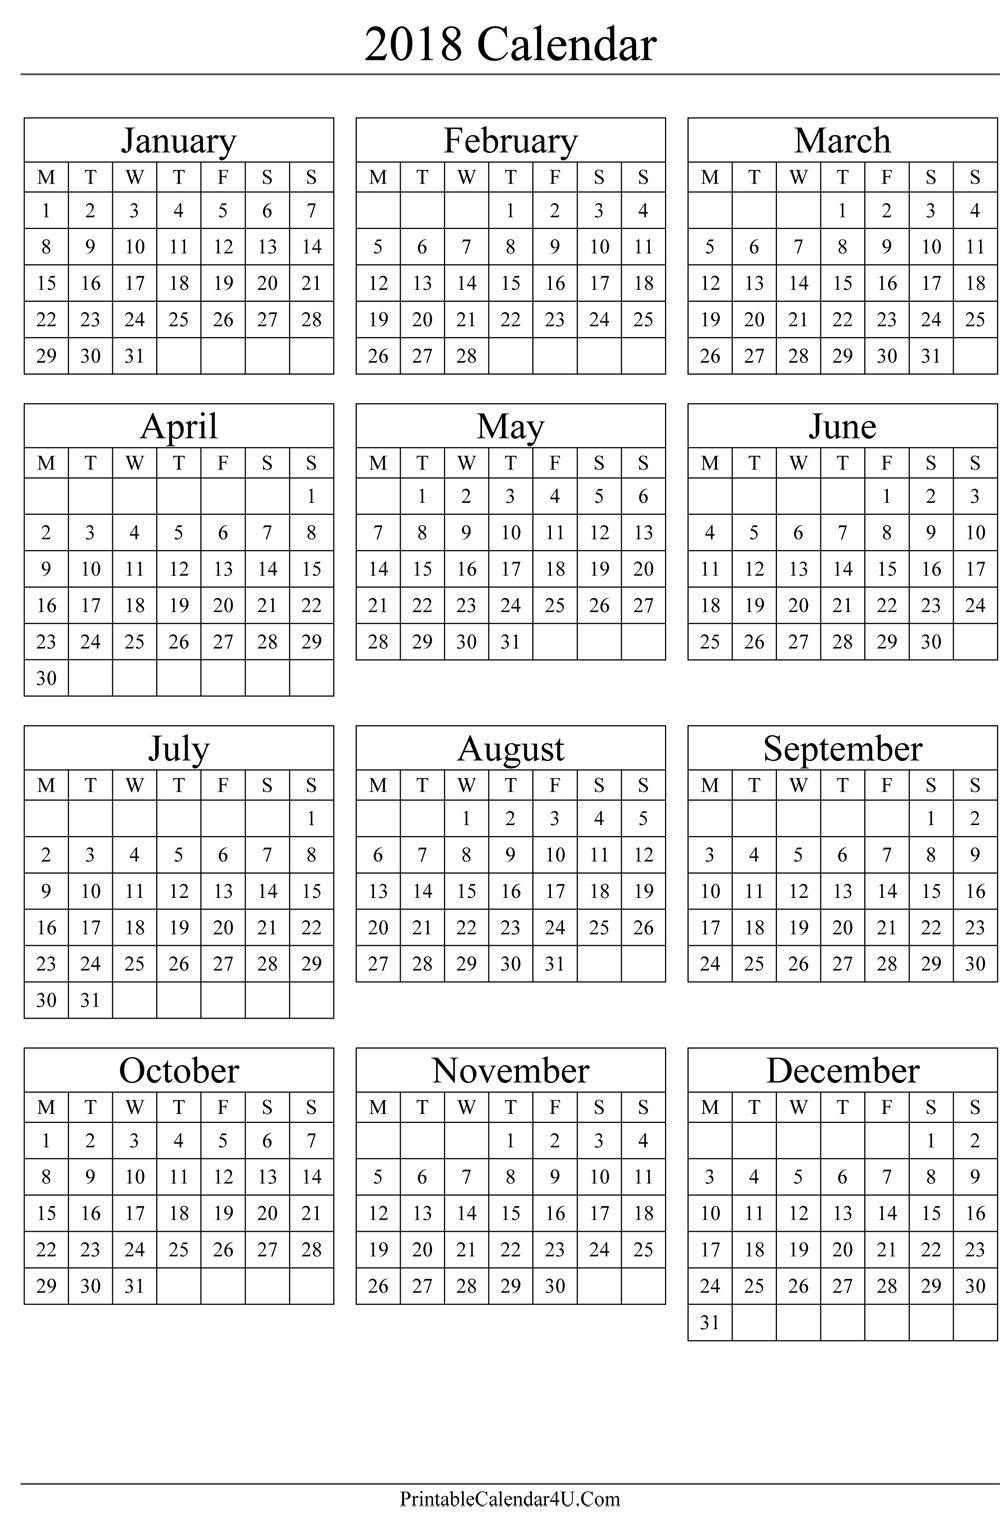 Pincalendar Printable On 2018 Calendar | Printable